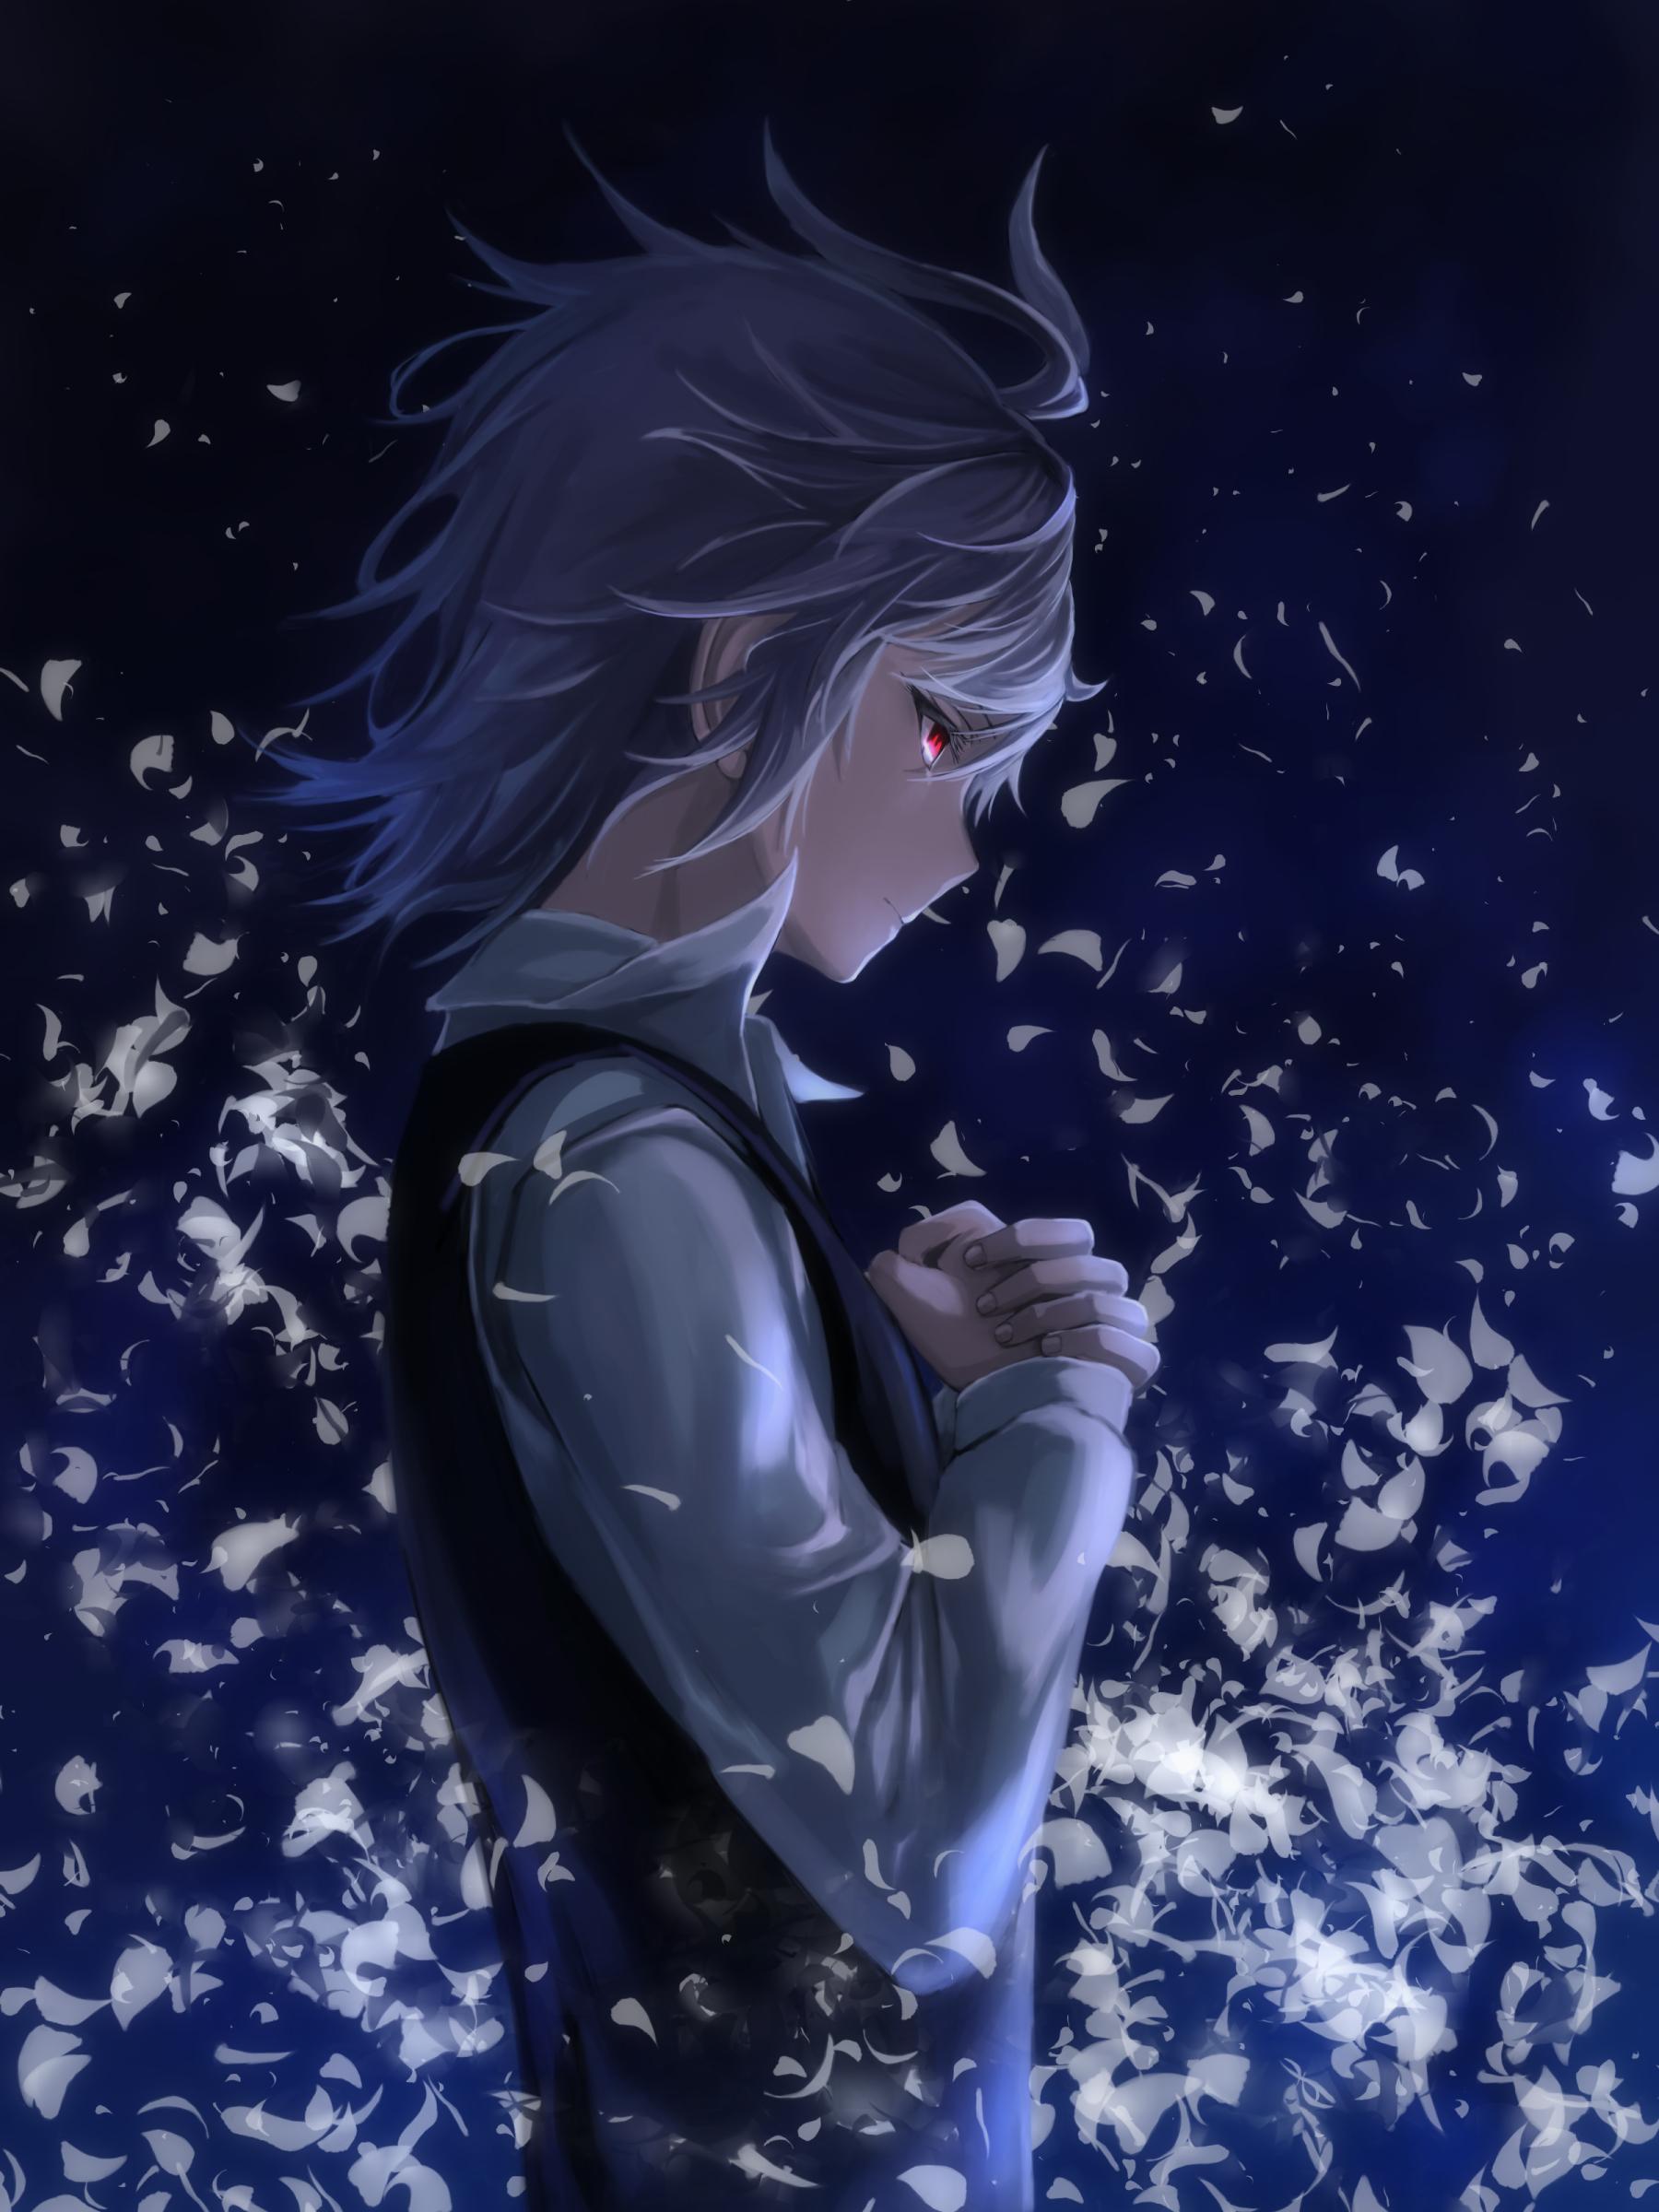 Sieg Fate Apocrypha Zerochan Anime Image Board